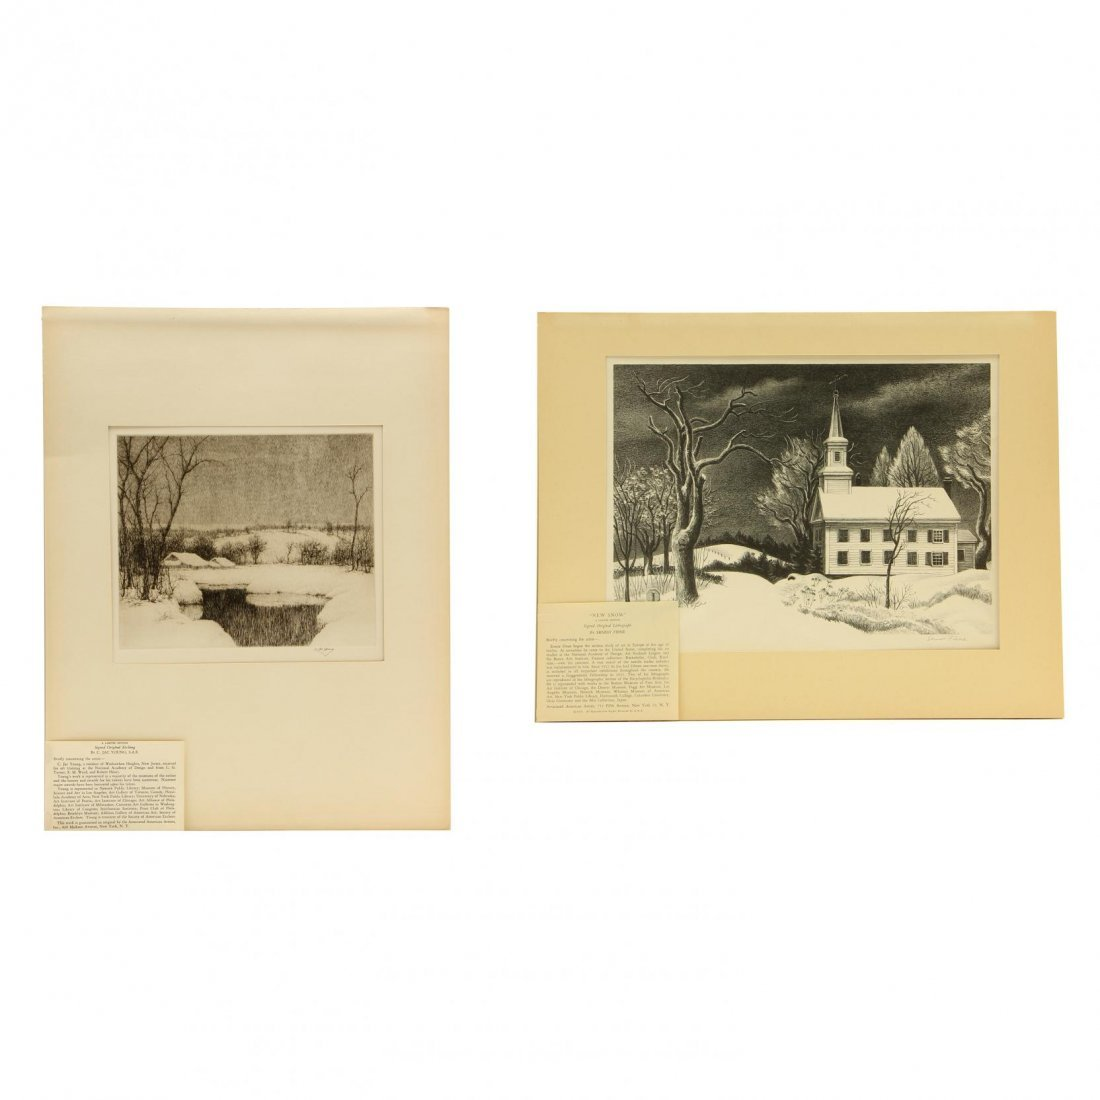 Two Snowy Scenes by Members of Associated American